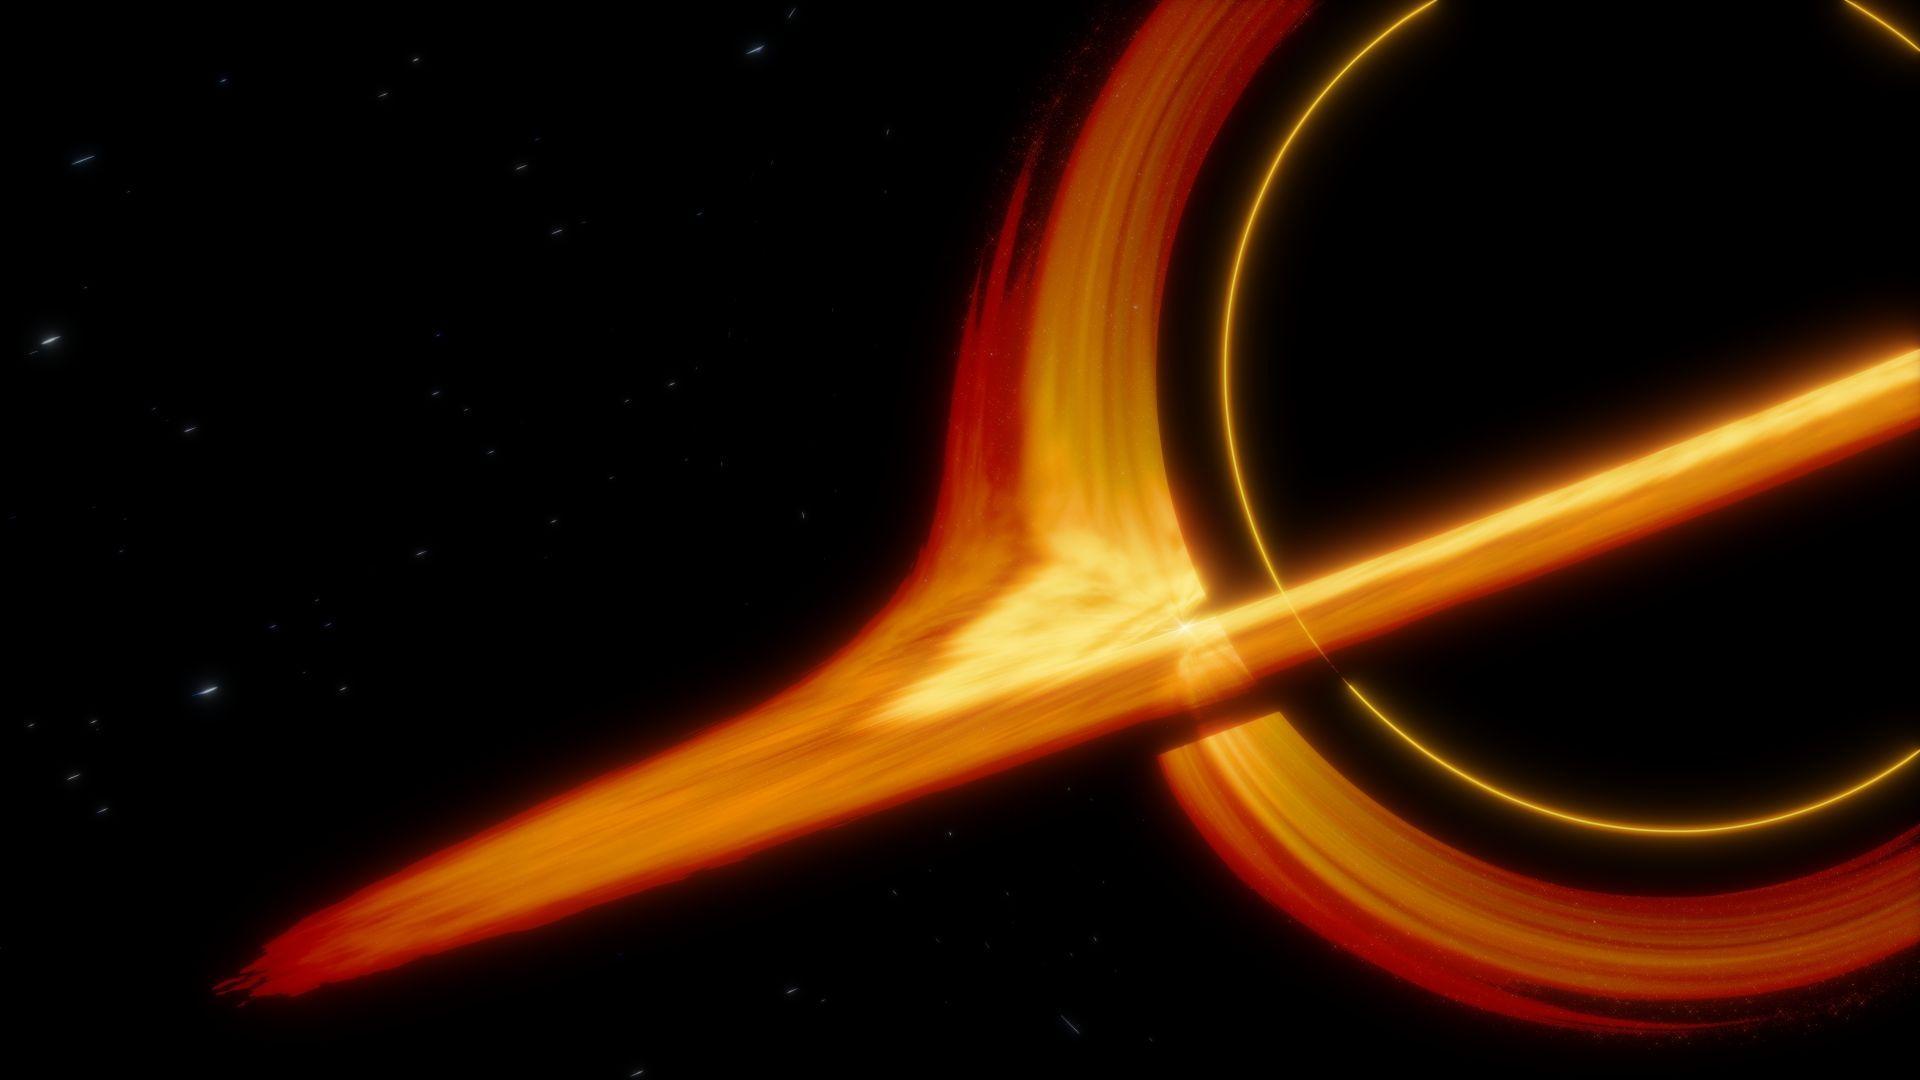 Artwork Orange Rings Black Hole Wallpaper Black Hole Wallpaper Black Hole Wallpaper